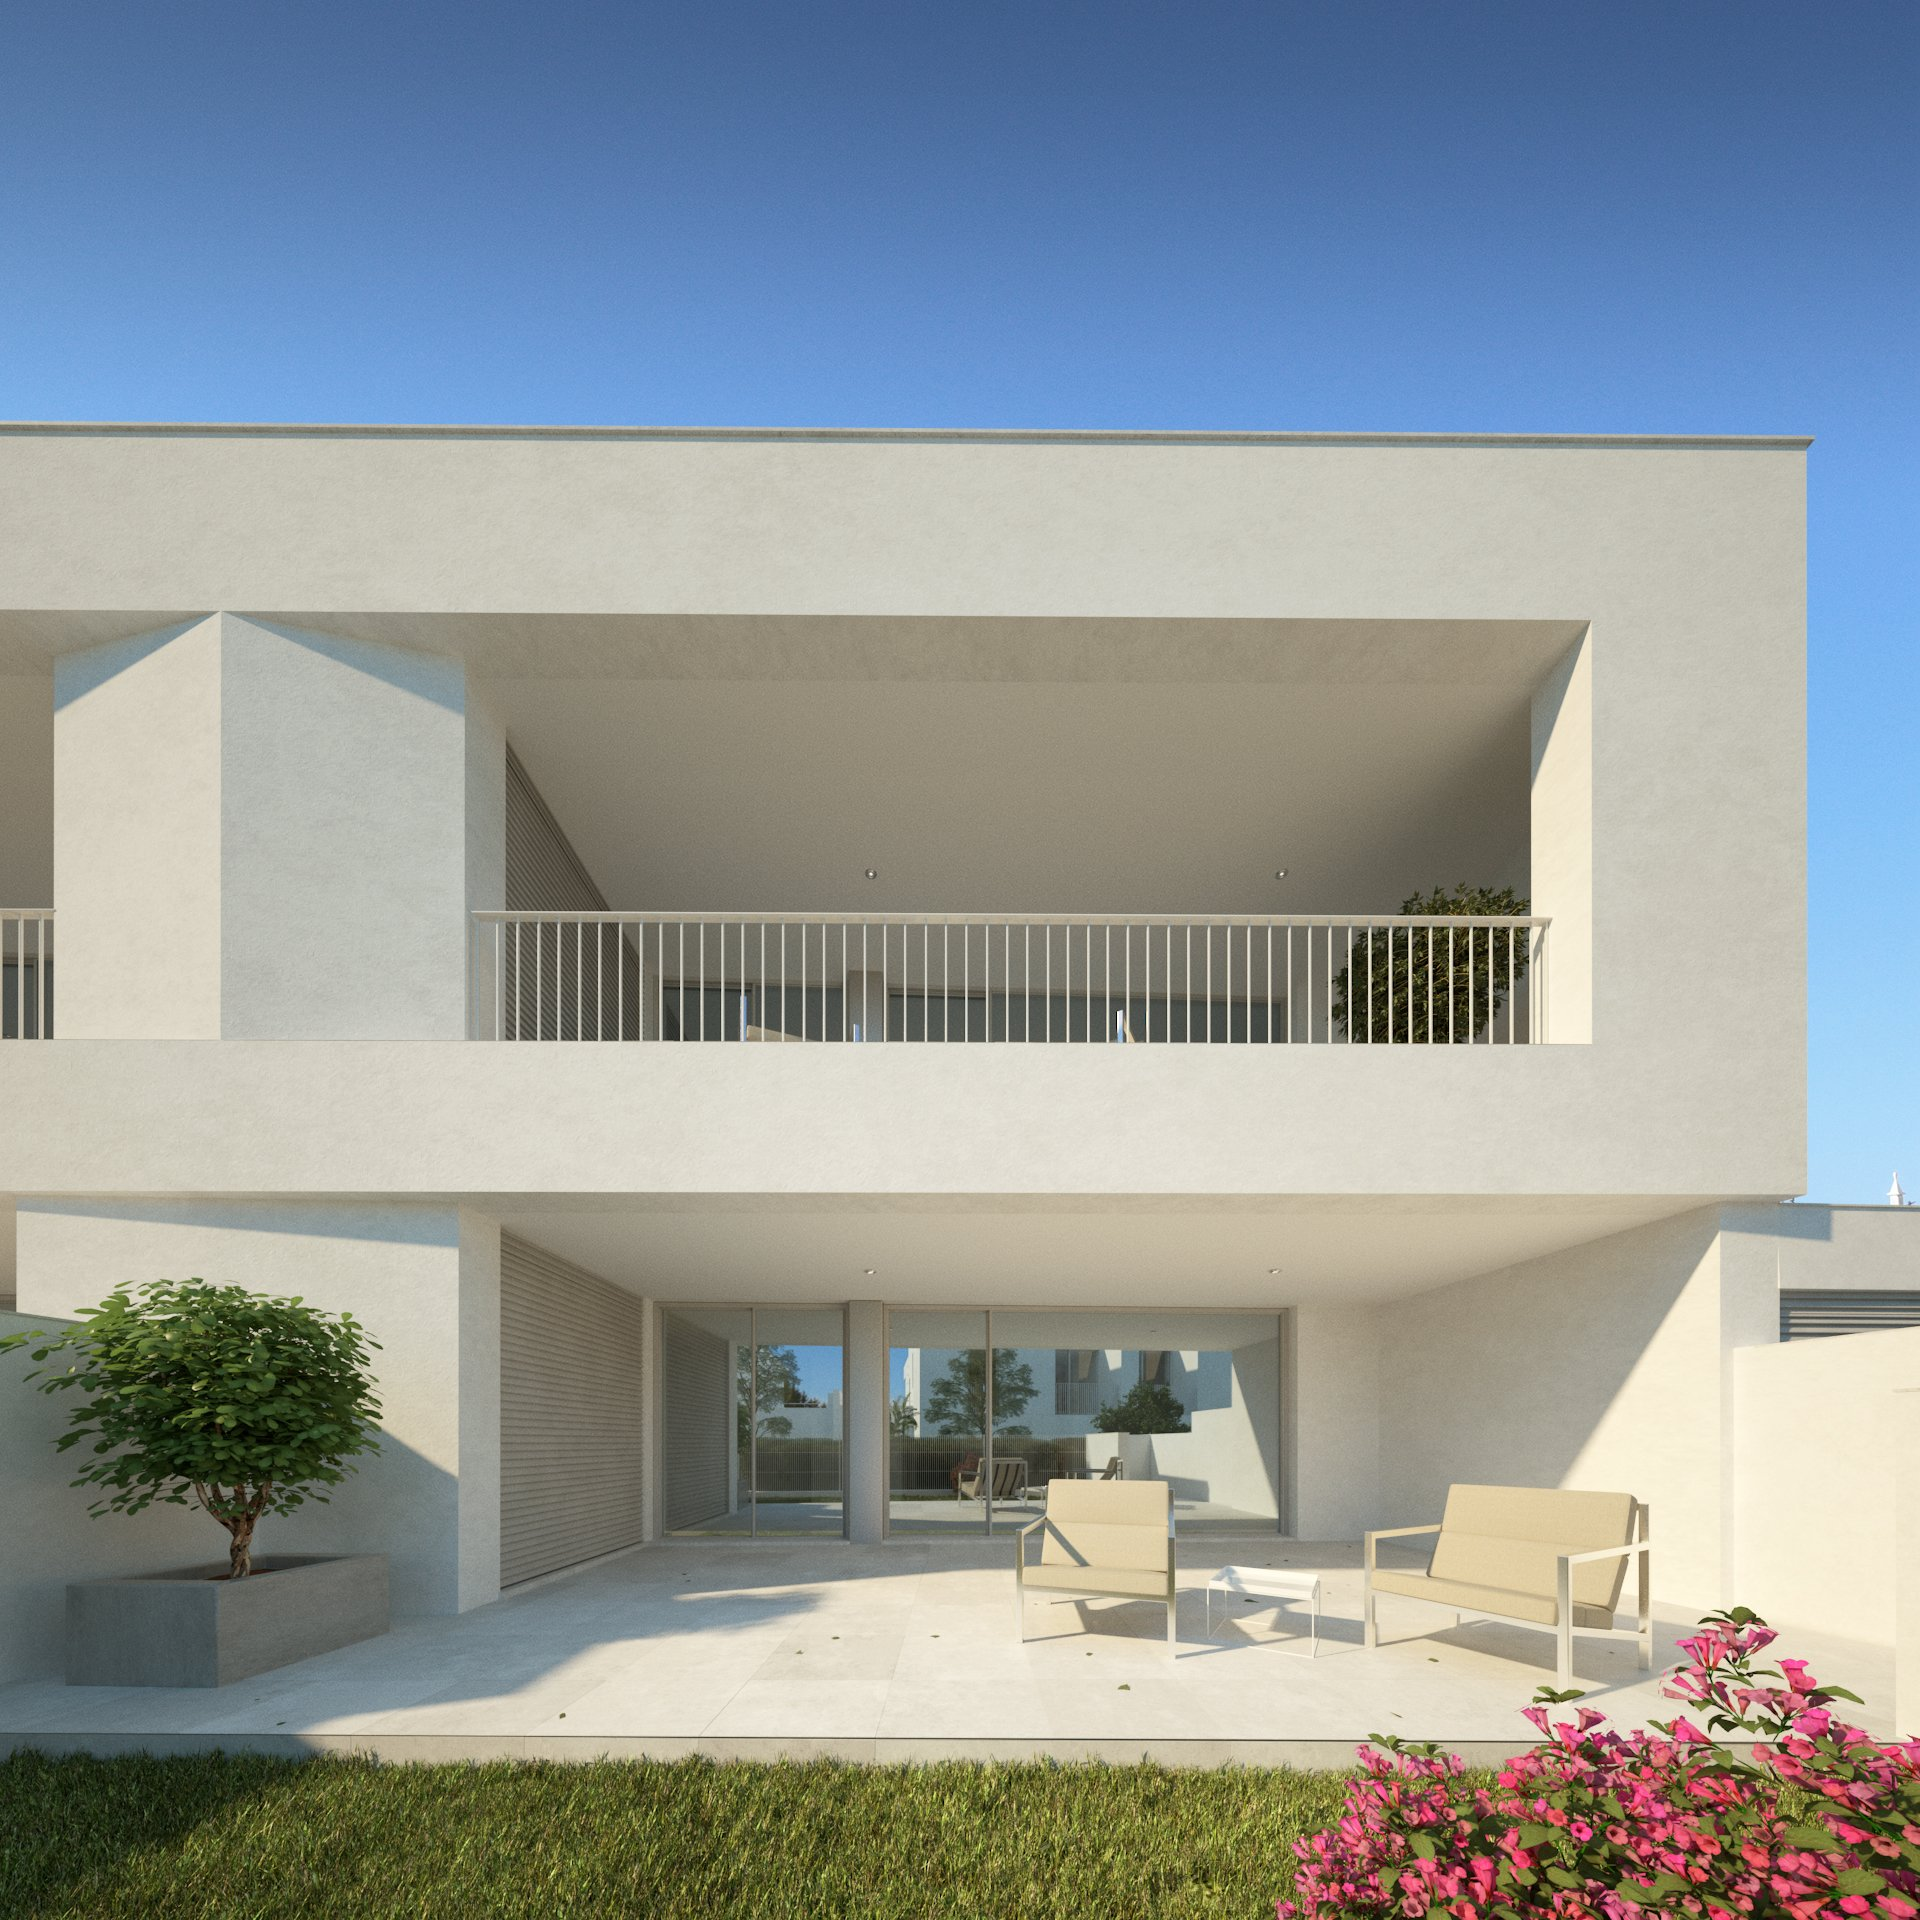 3 Bedroom Townhouse Lagos, Western Algarve Ref: GV618